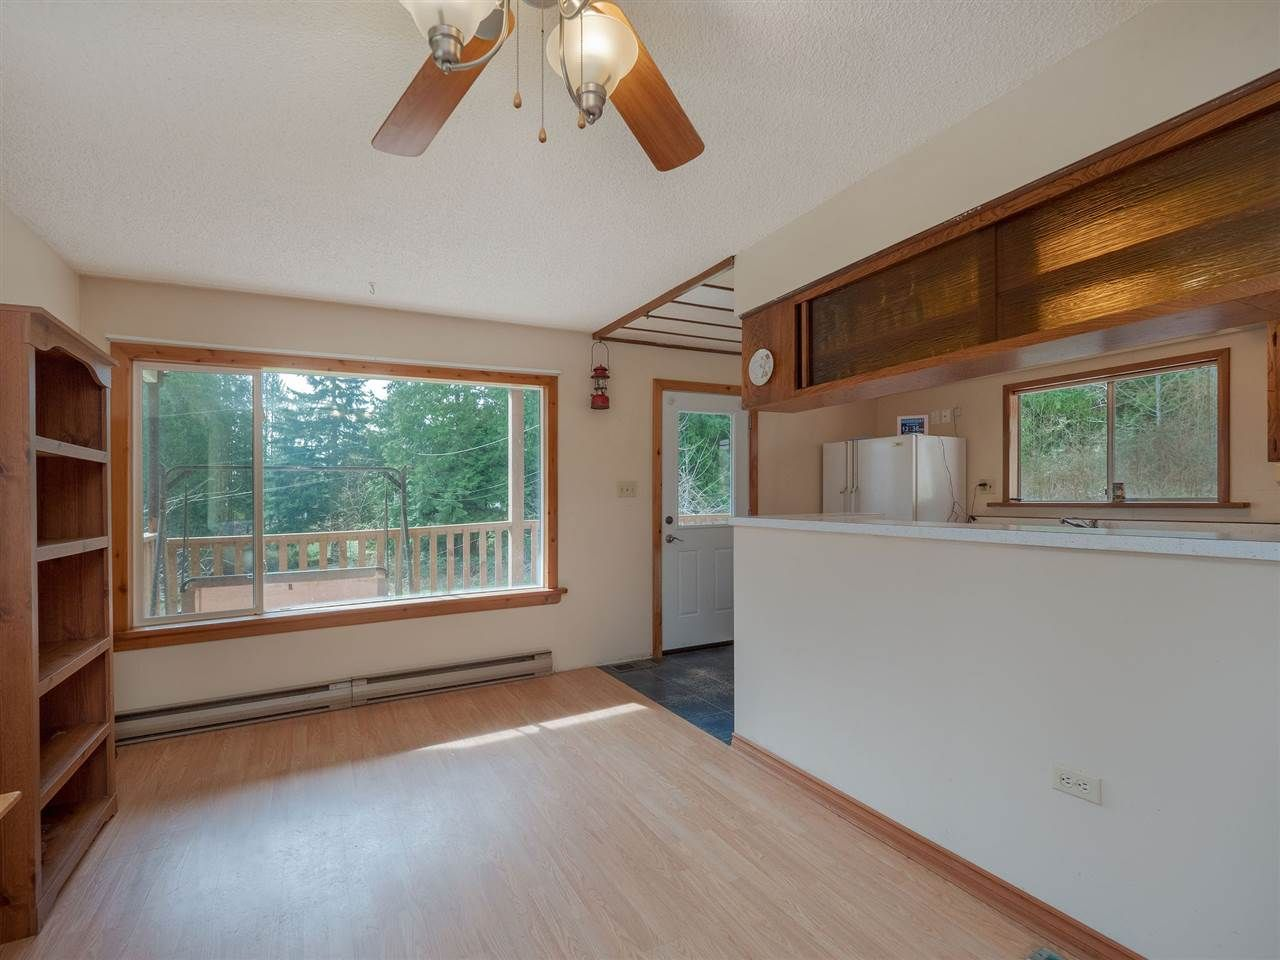 Photo 8: Photos: 6820 NORWEST BAY Road in Sechelt: Sechelt District House for sale (Sunshine Coast)  : MLS®# R2553107